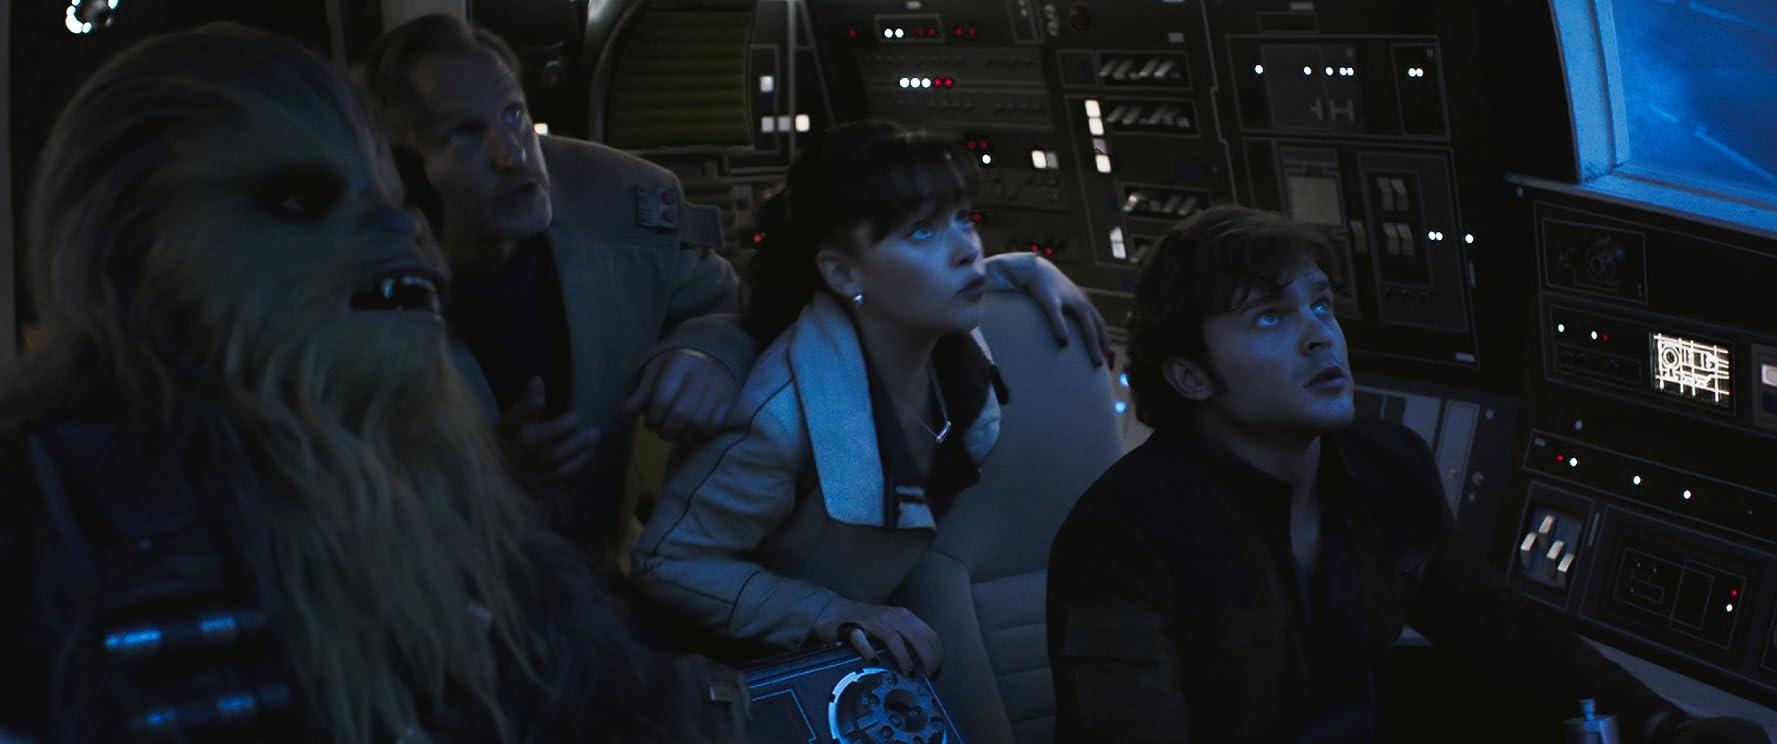 Woody Harrelson, Alden Ehrenreich, Emilia Clarke, and Joonas Suotamo in Solo: A Star Wars Story (2018)